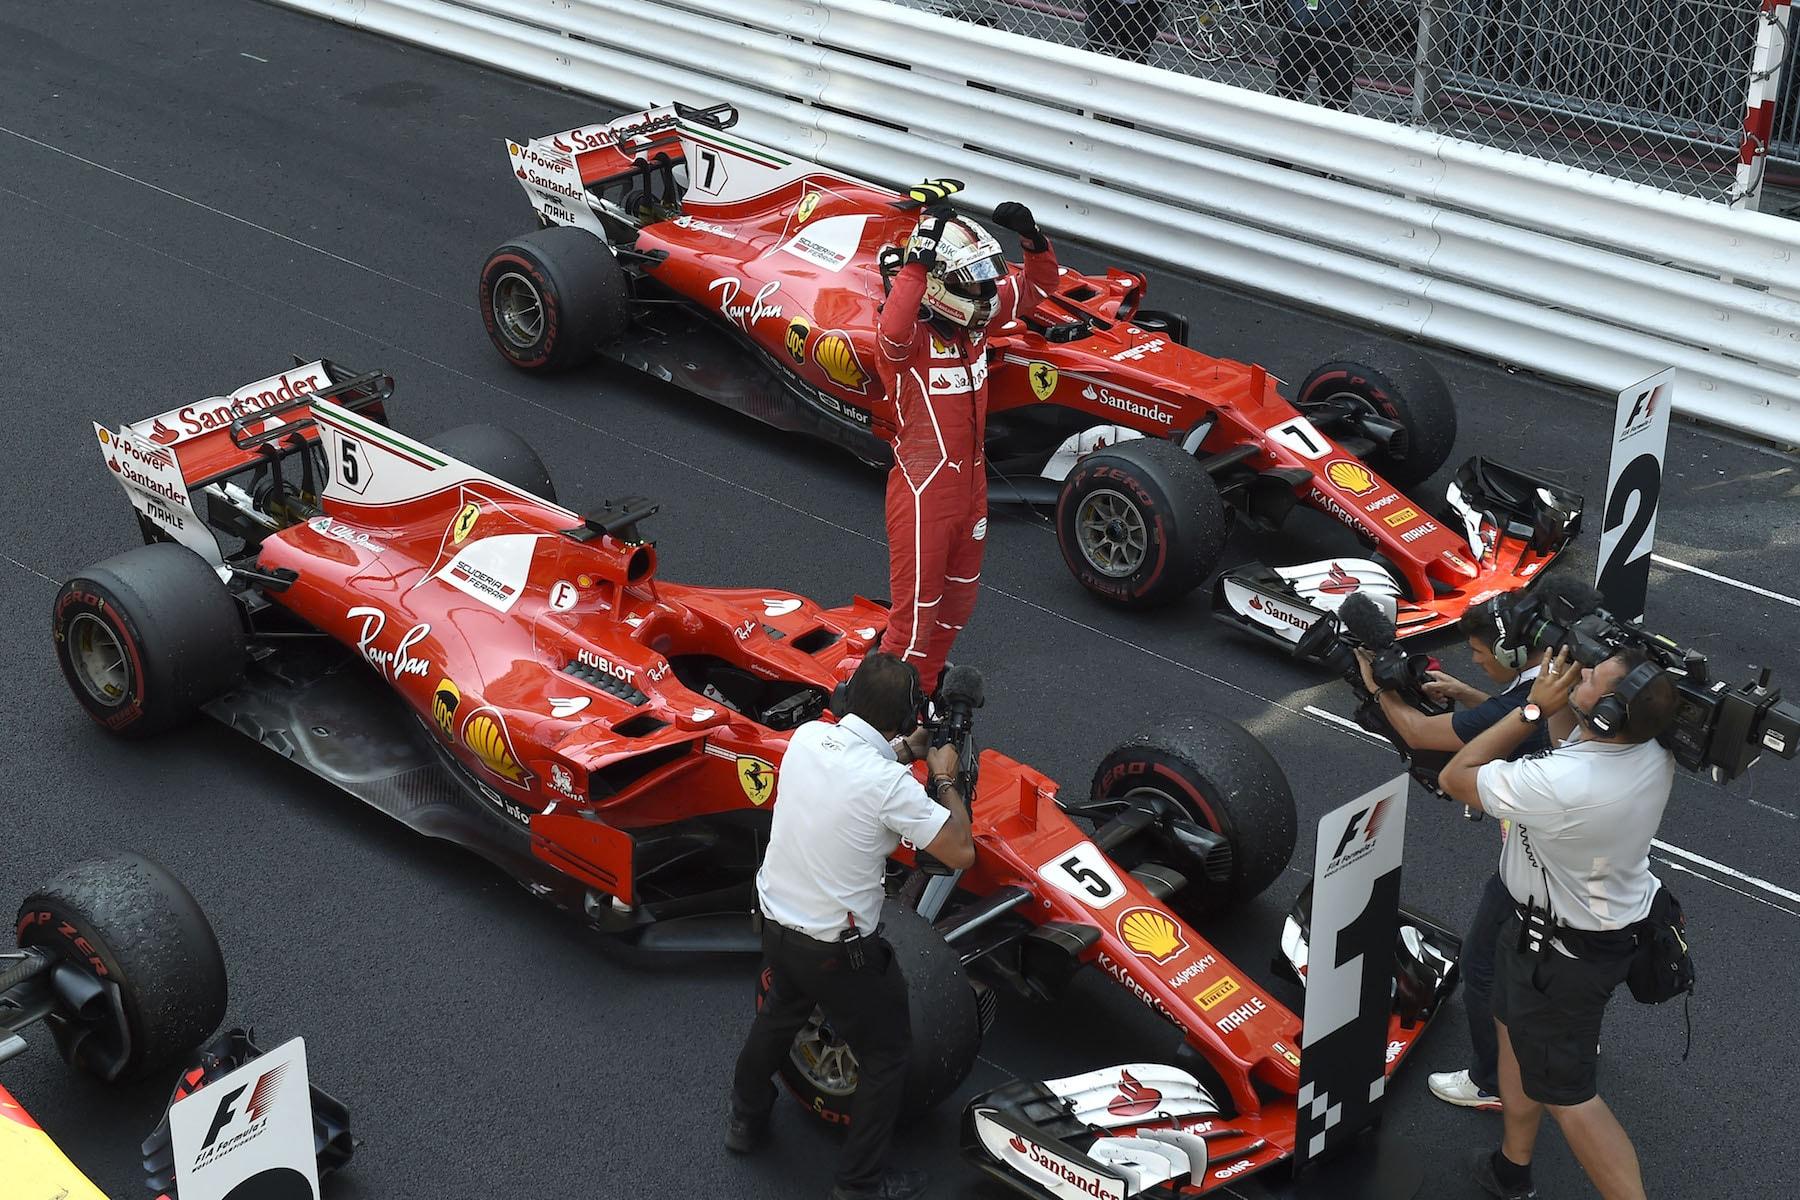 S 2017 Sebastian Vettel | Ferrari SF70H | 2017 Monaco GP winner 4 copy.jpg